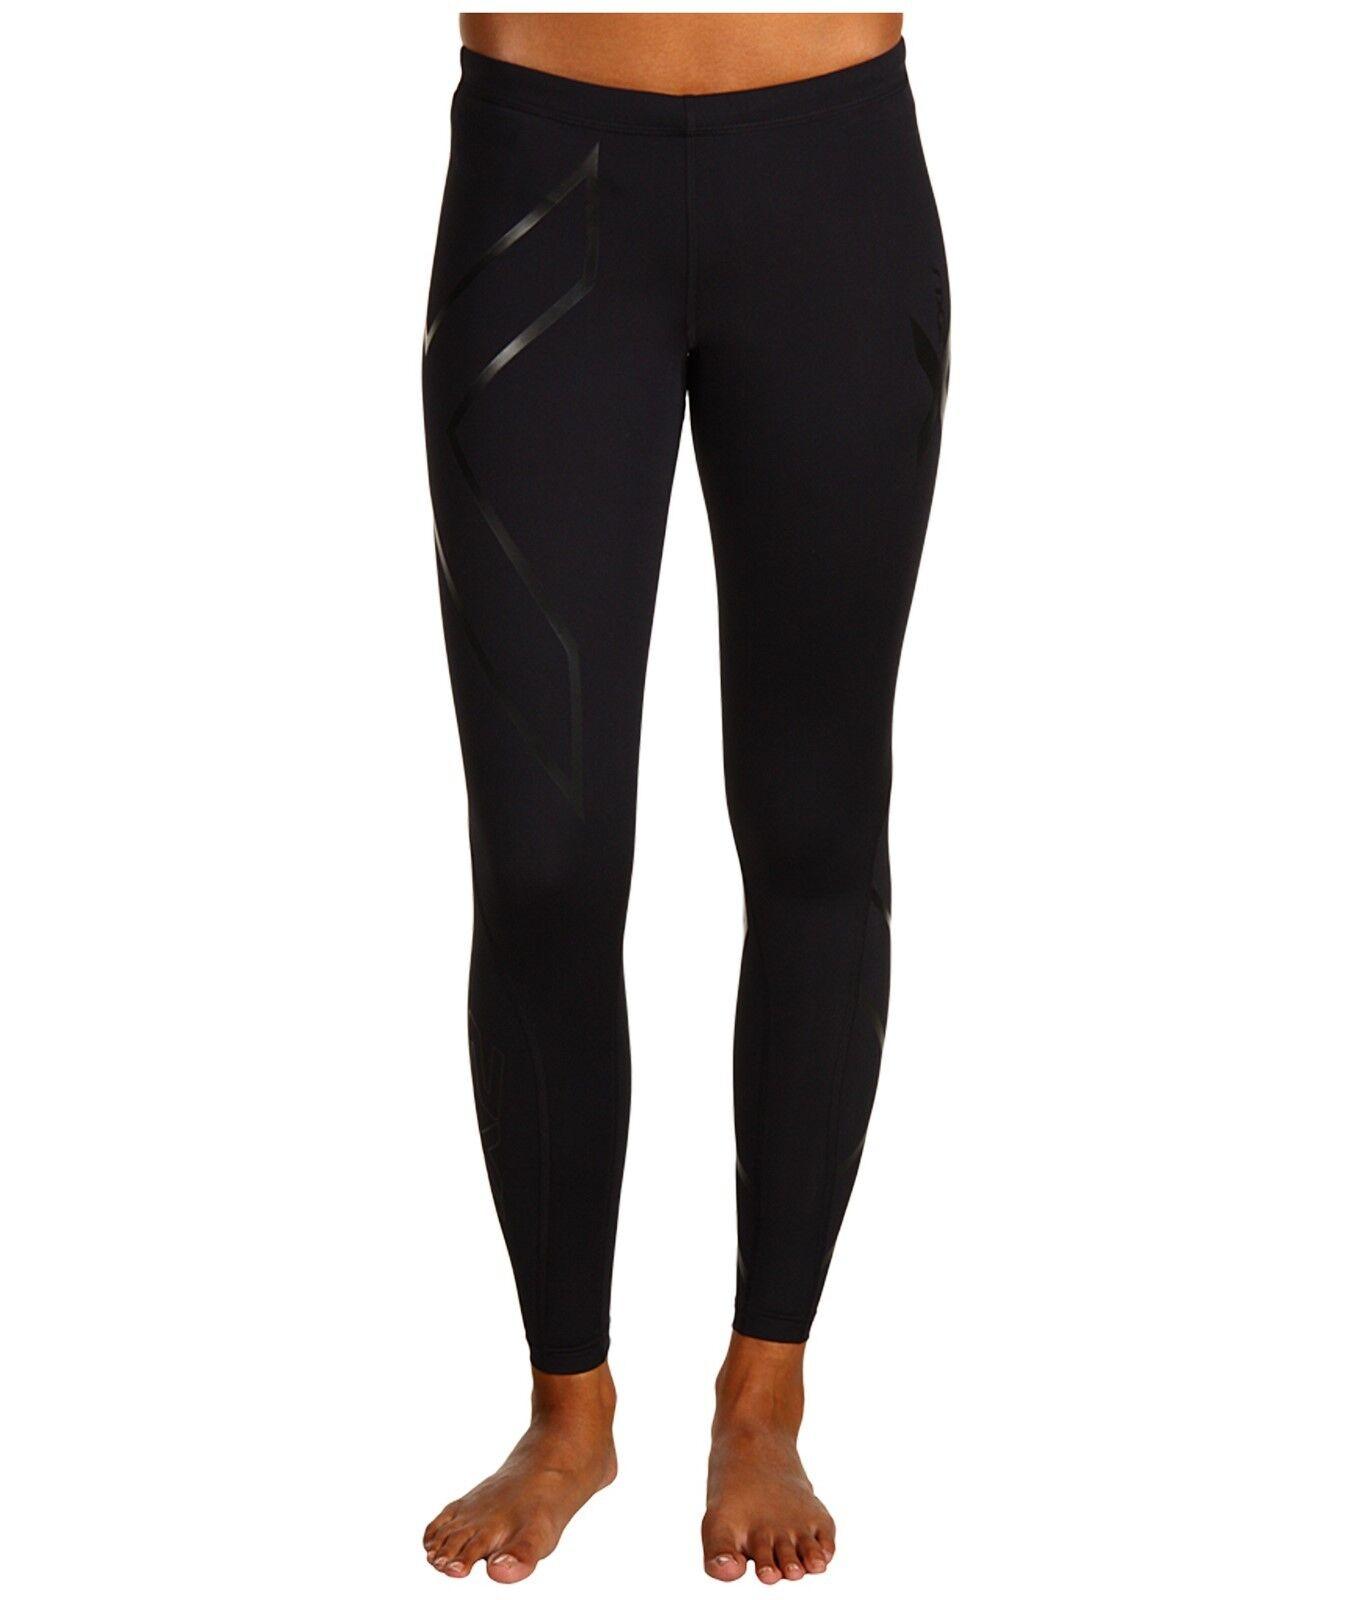 2XU Ripresa Compressione Pantaloni da Corsa, MISURE XS 150cm175cm;4050kg Nib